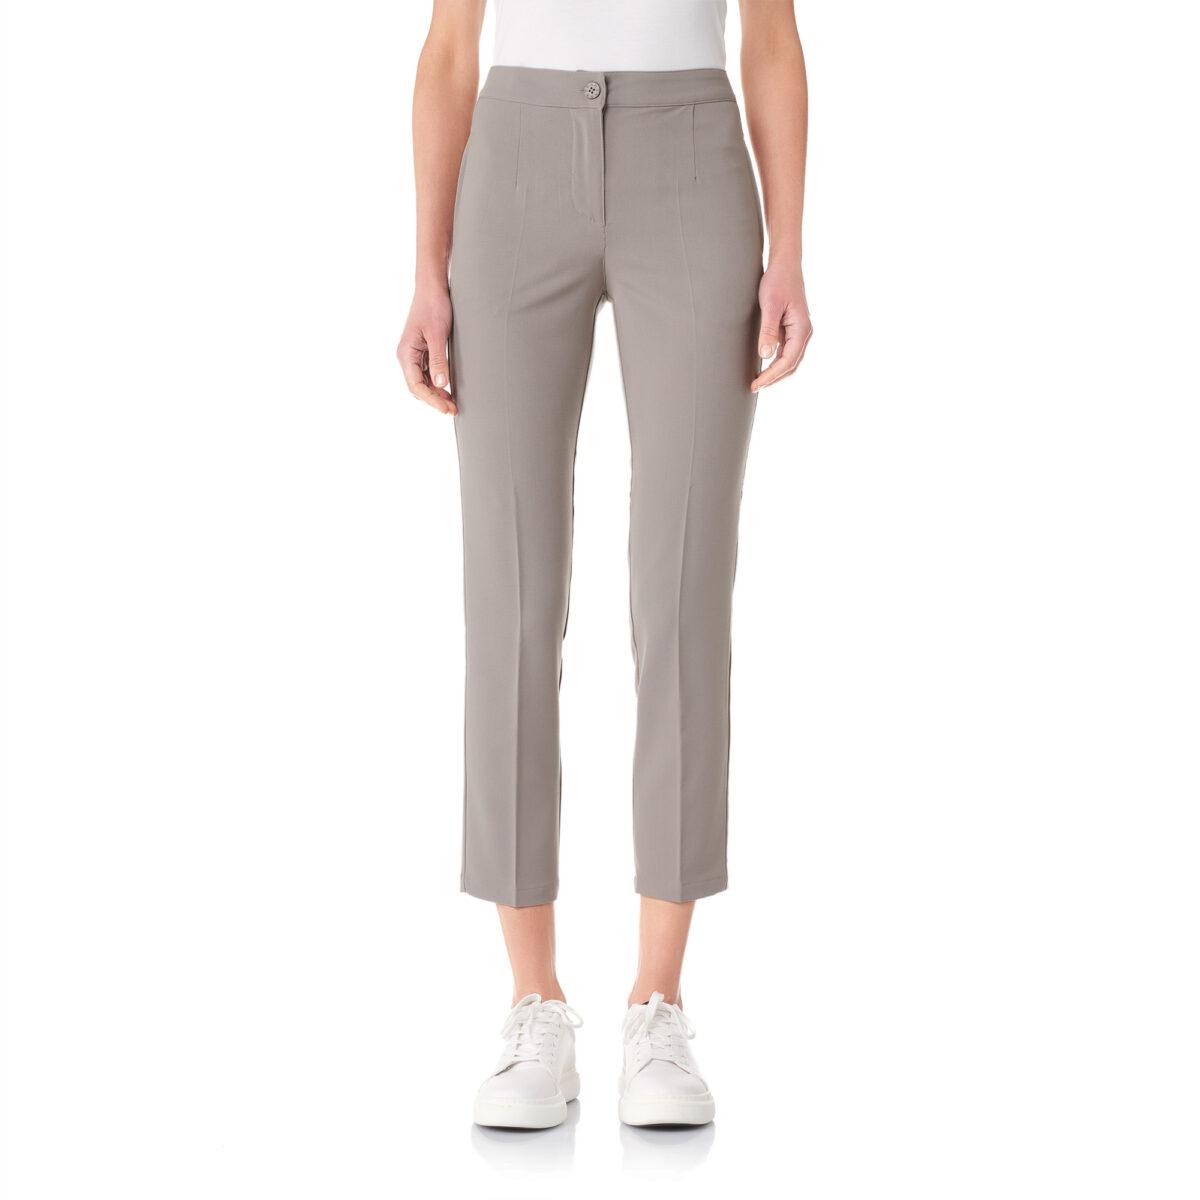 Pantalone Straight Grigio - Nicla